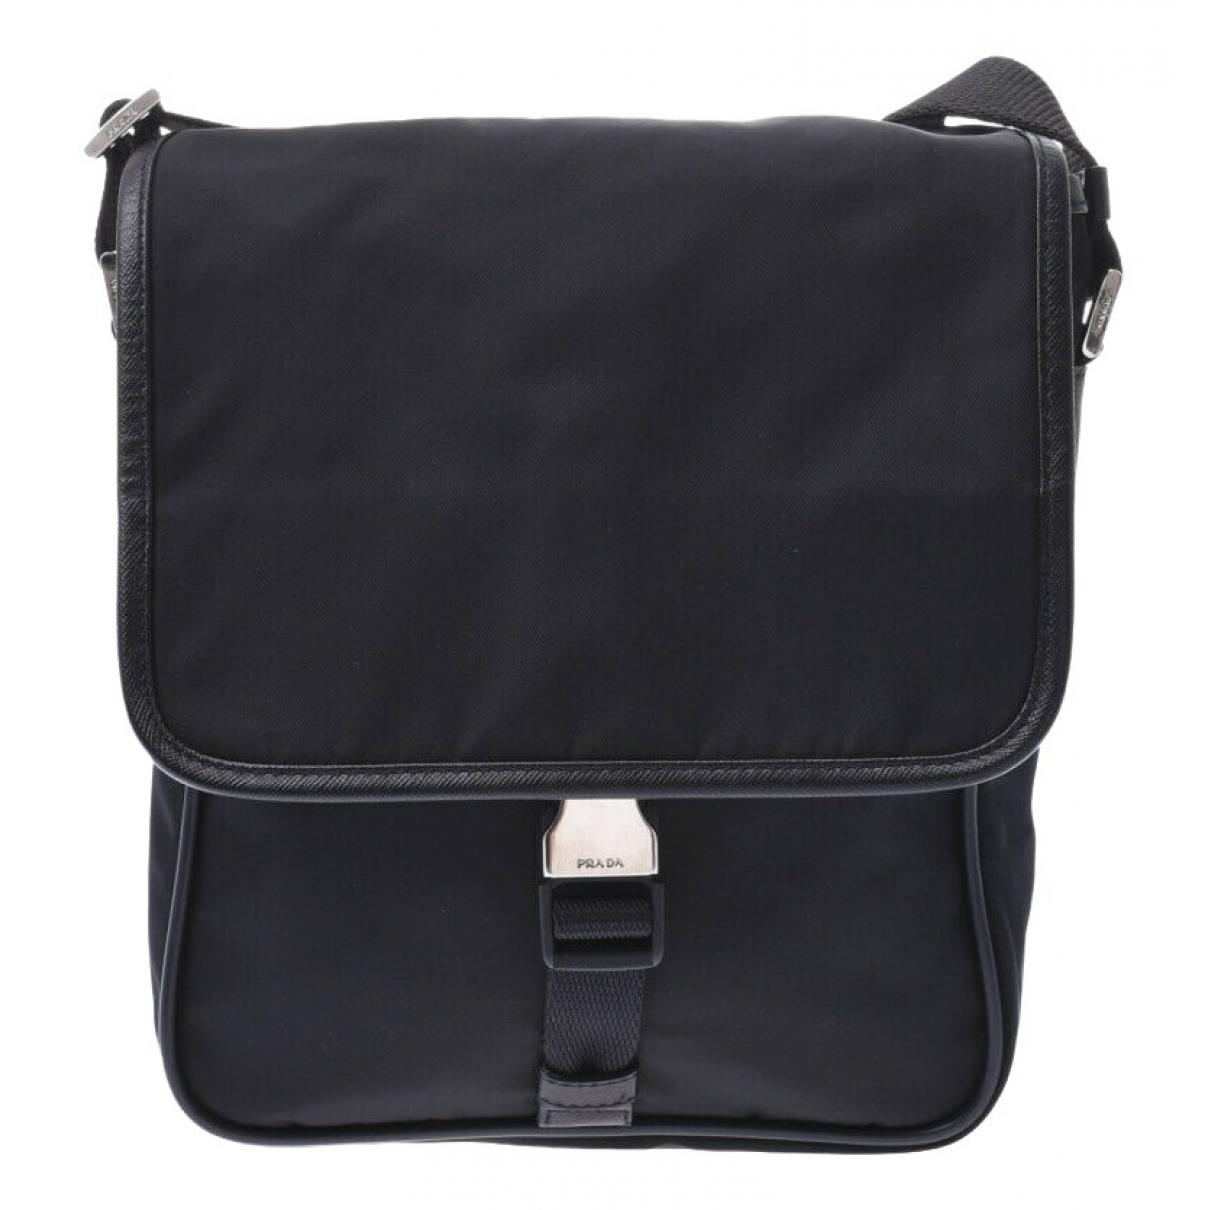 Prada \N Black handbag for Women \N